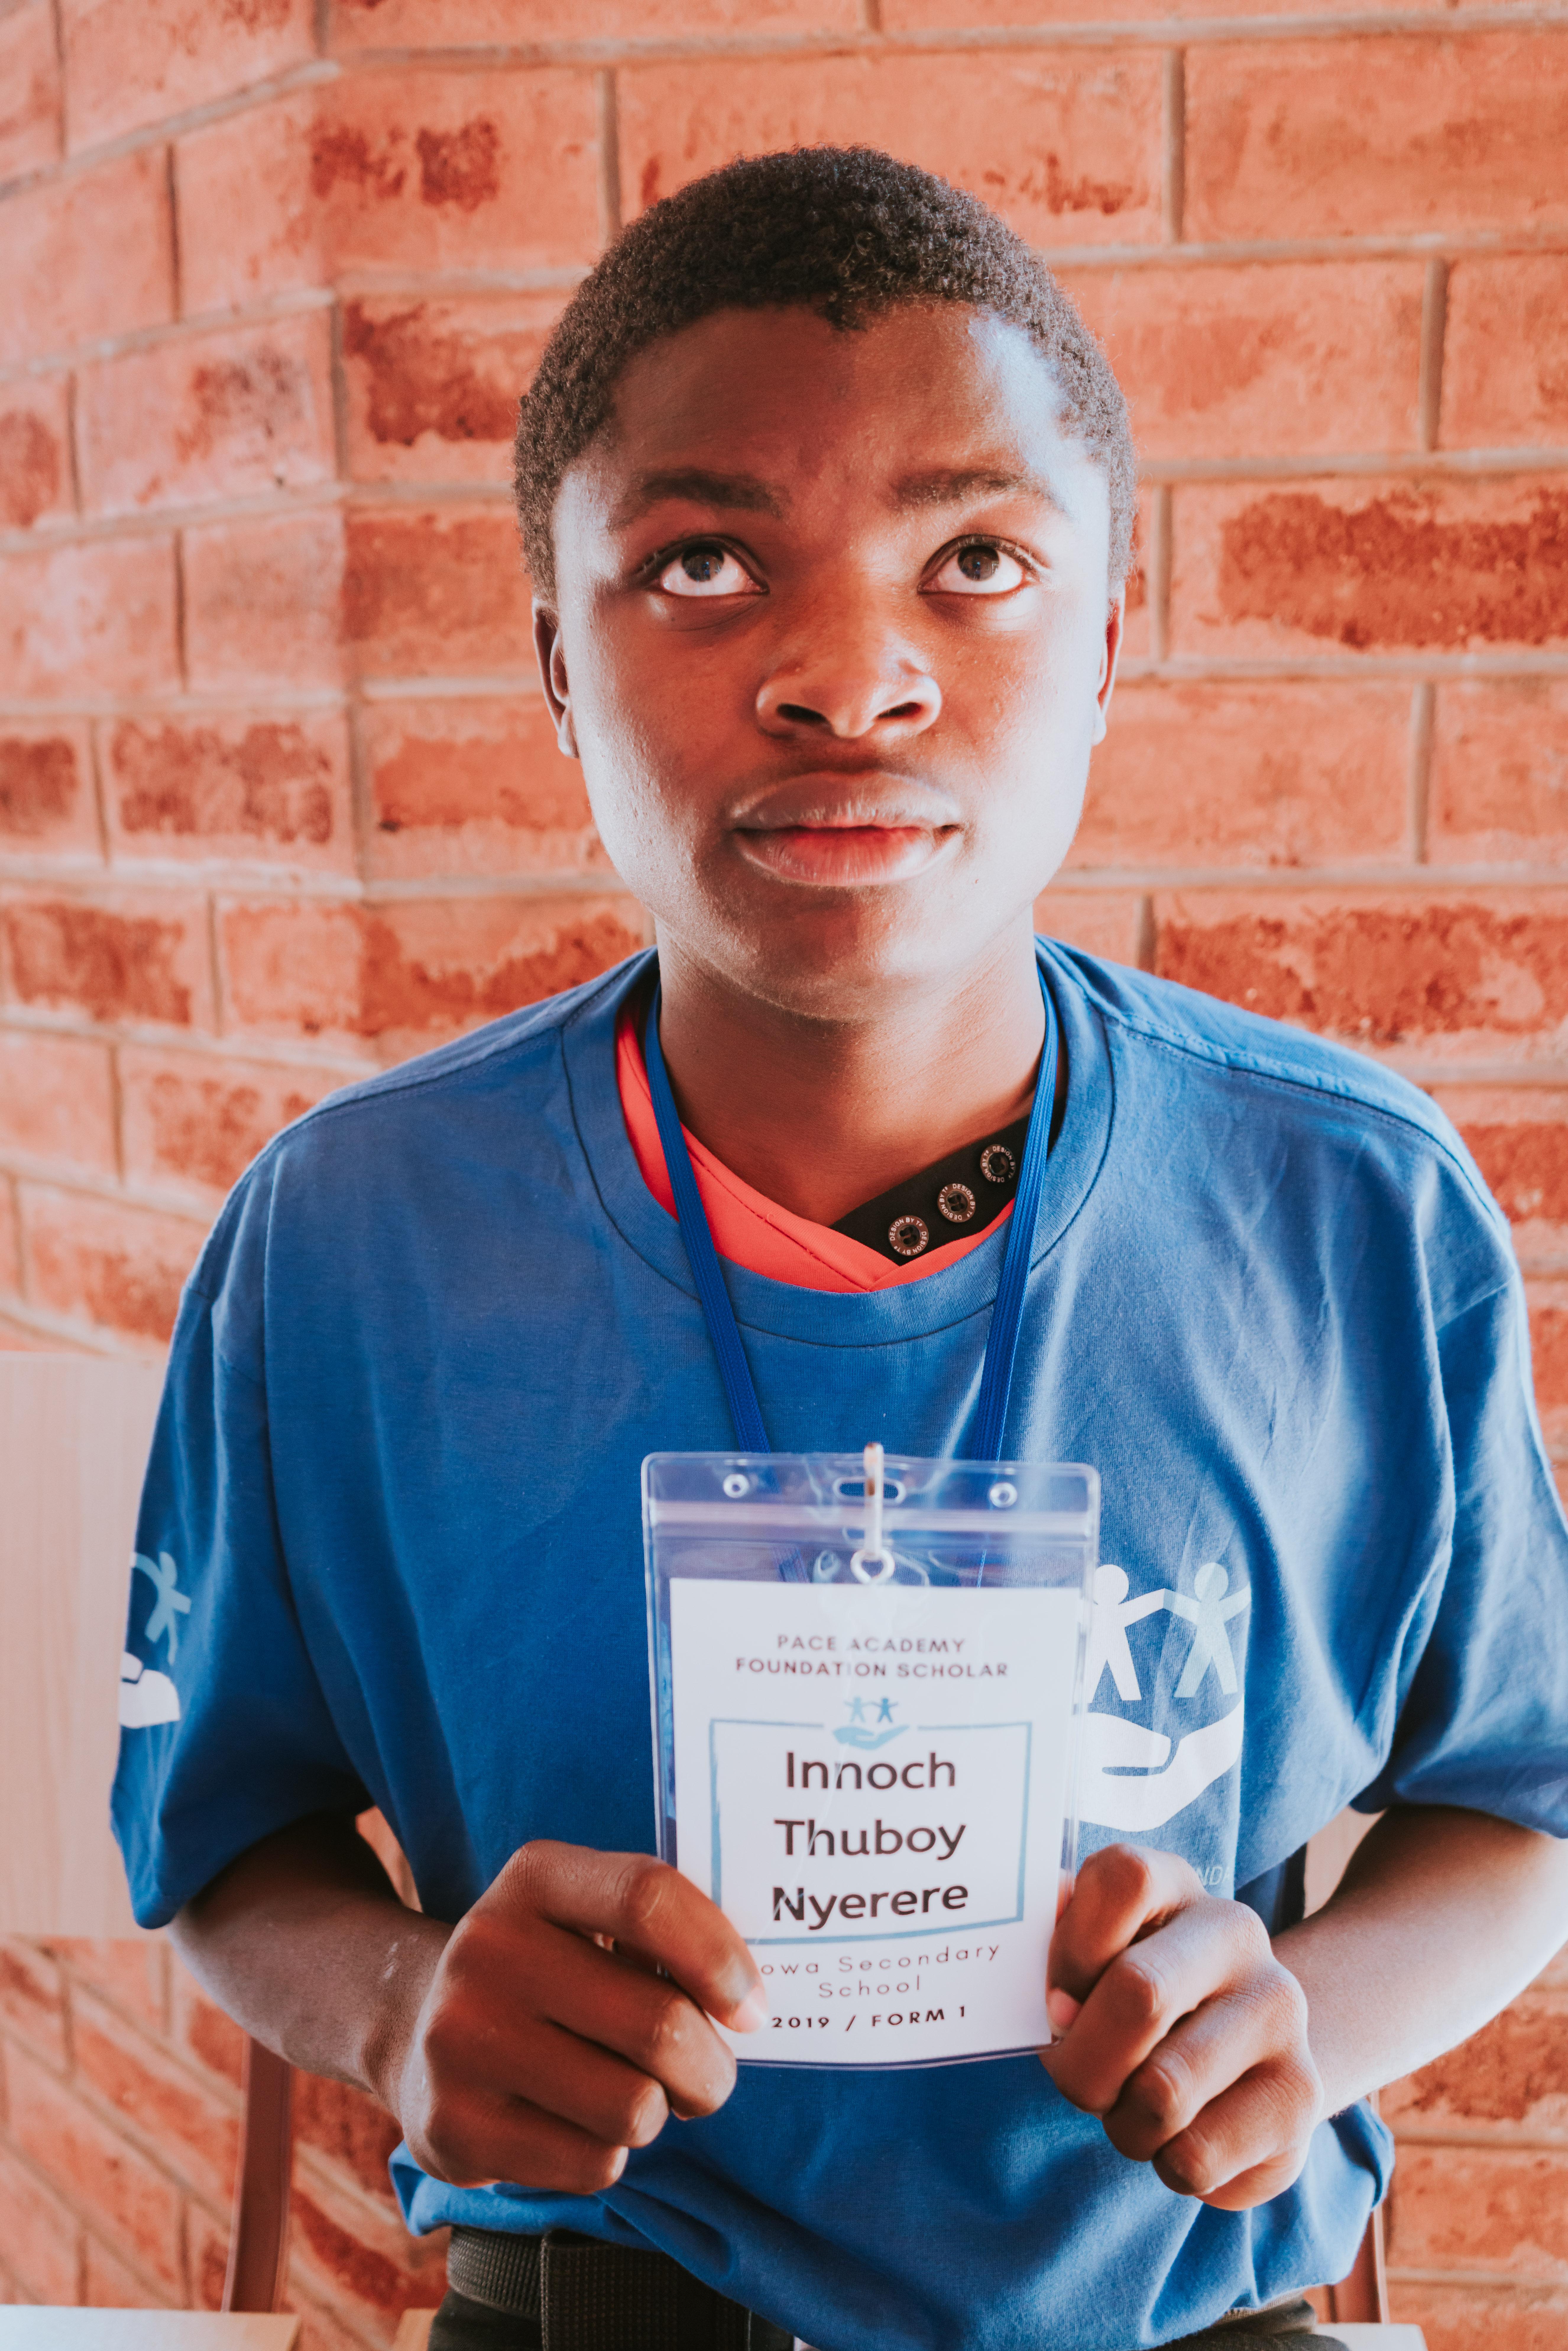 Innoch Thuboy Nyerere (Dowa Secondary Sc